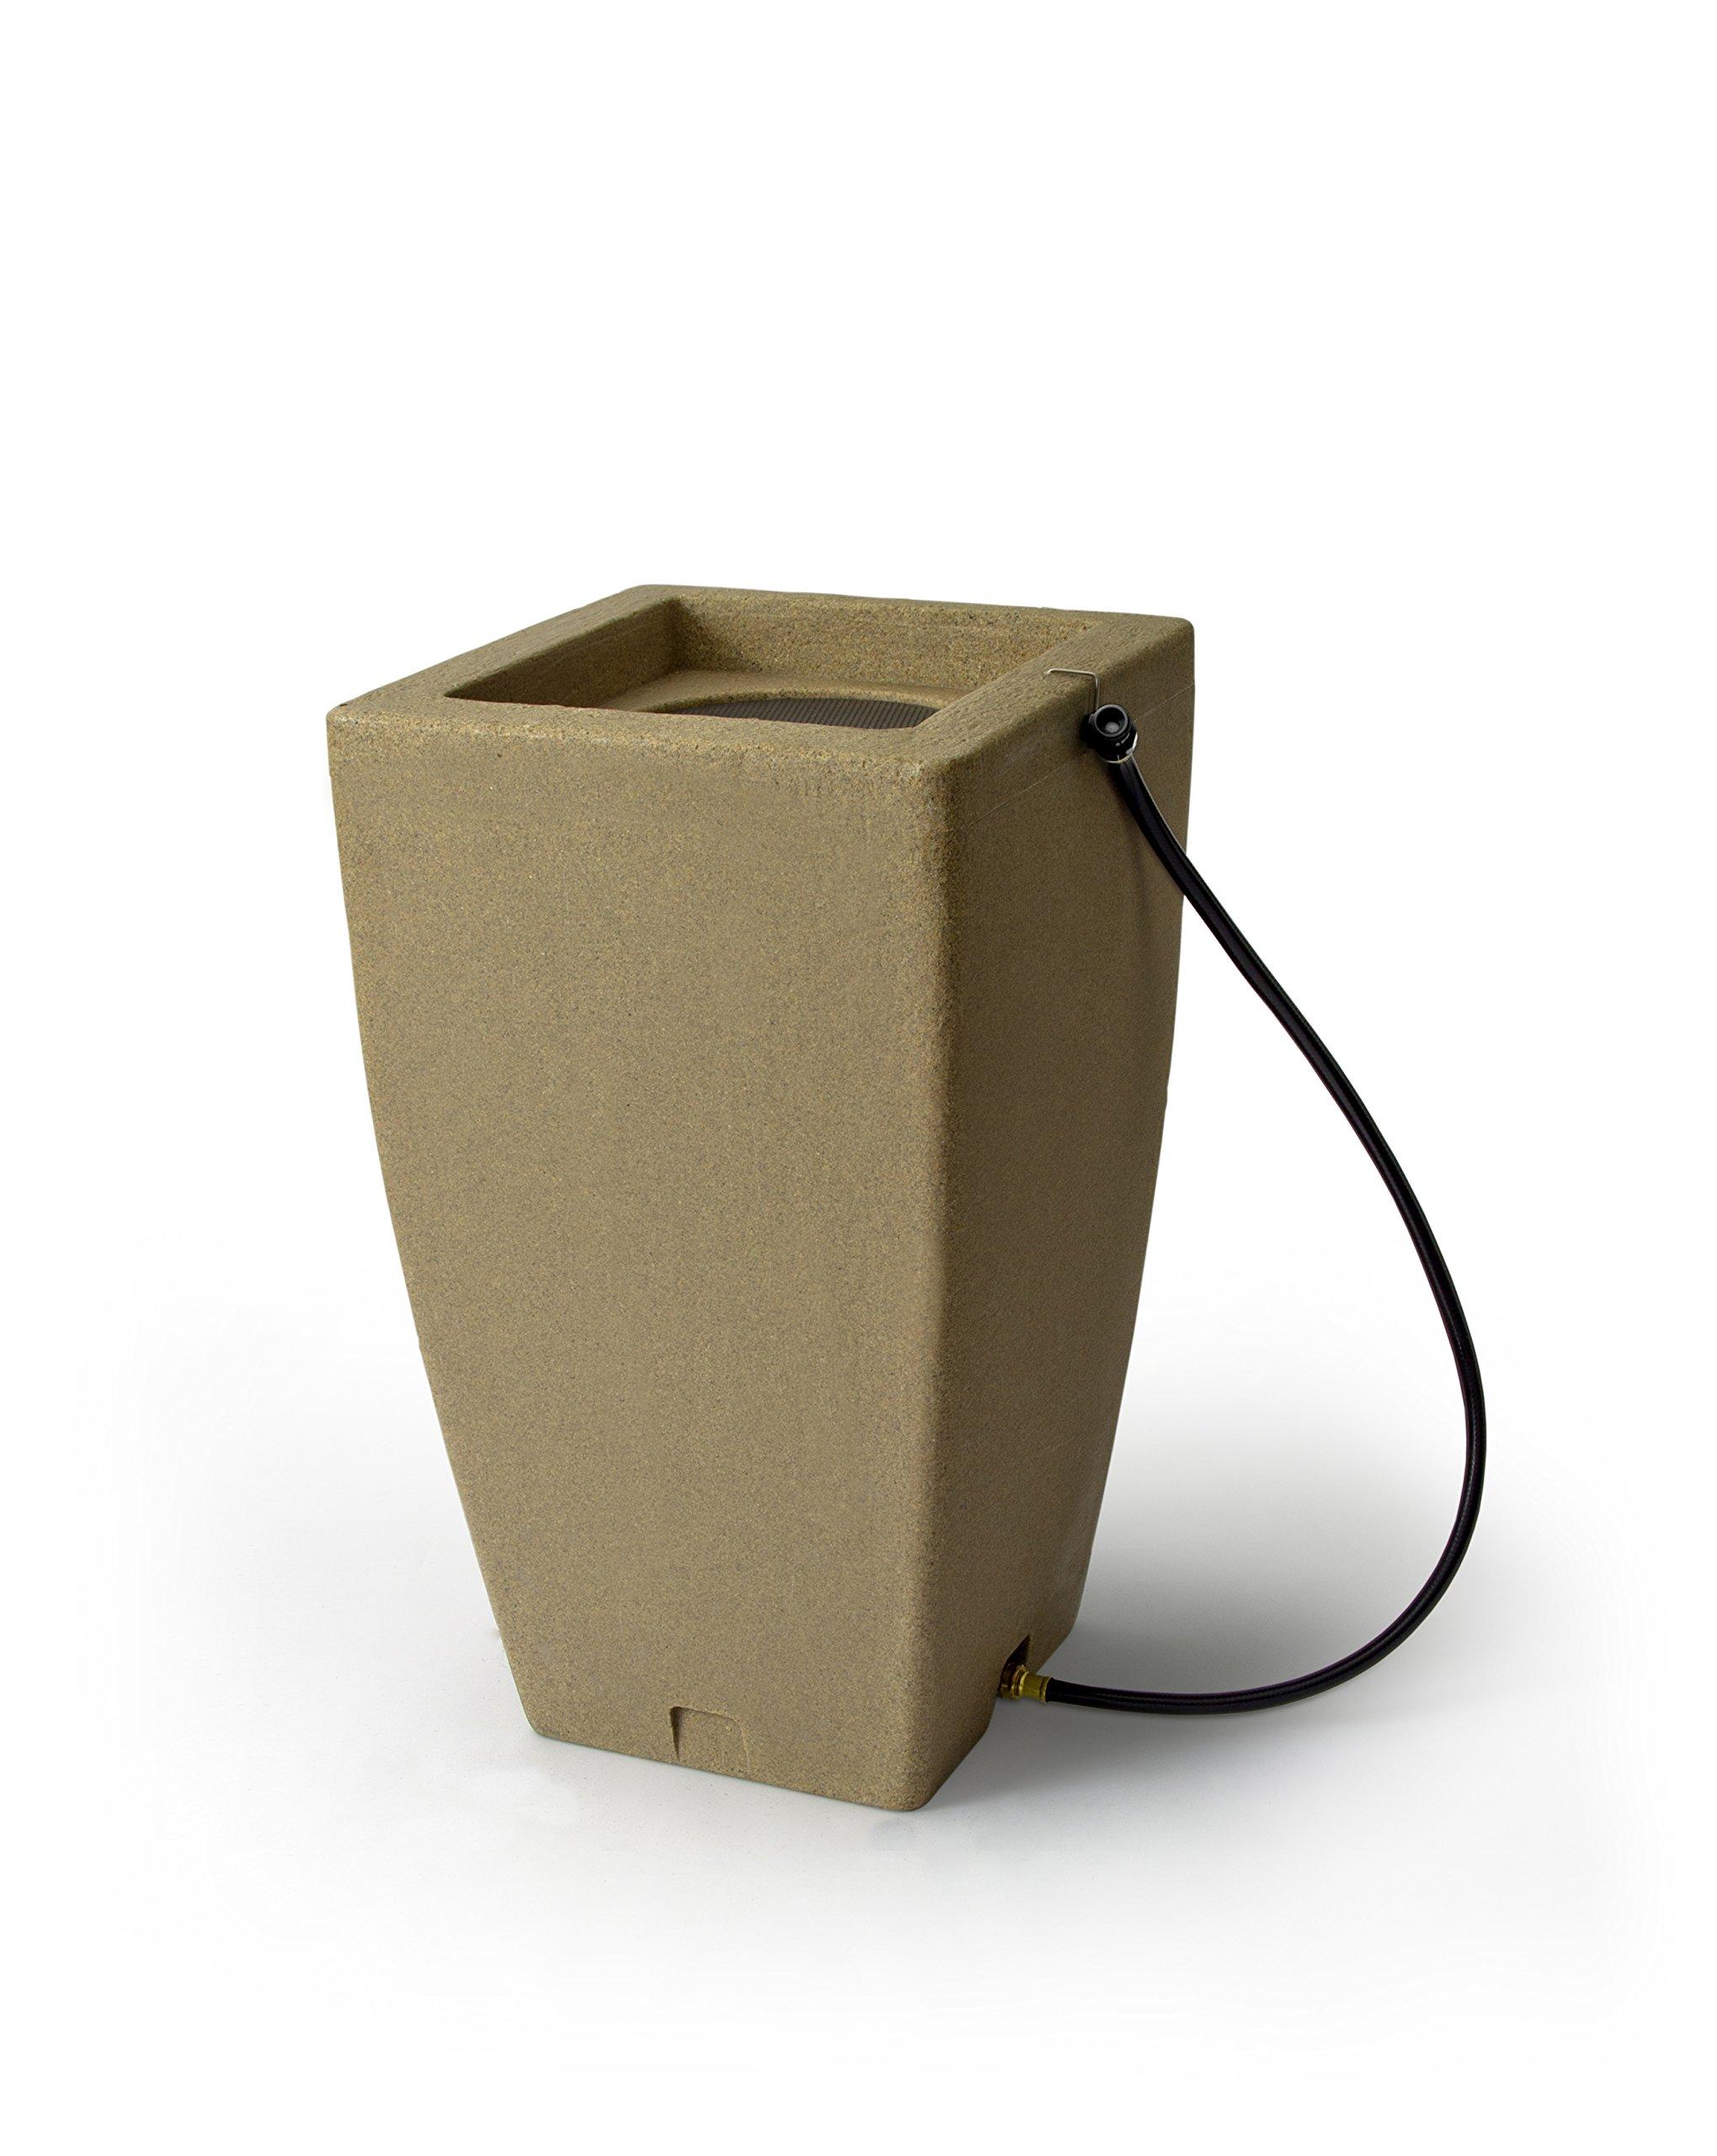 Algreen 84232  Products Madison Rain Barrel 49-Gallon, Sandstone by Algreen